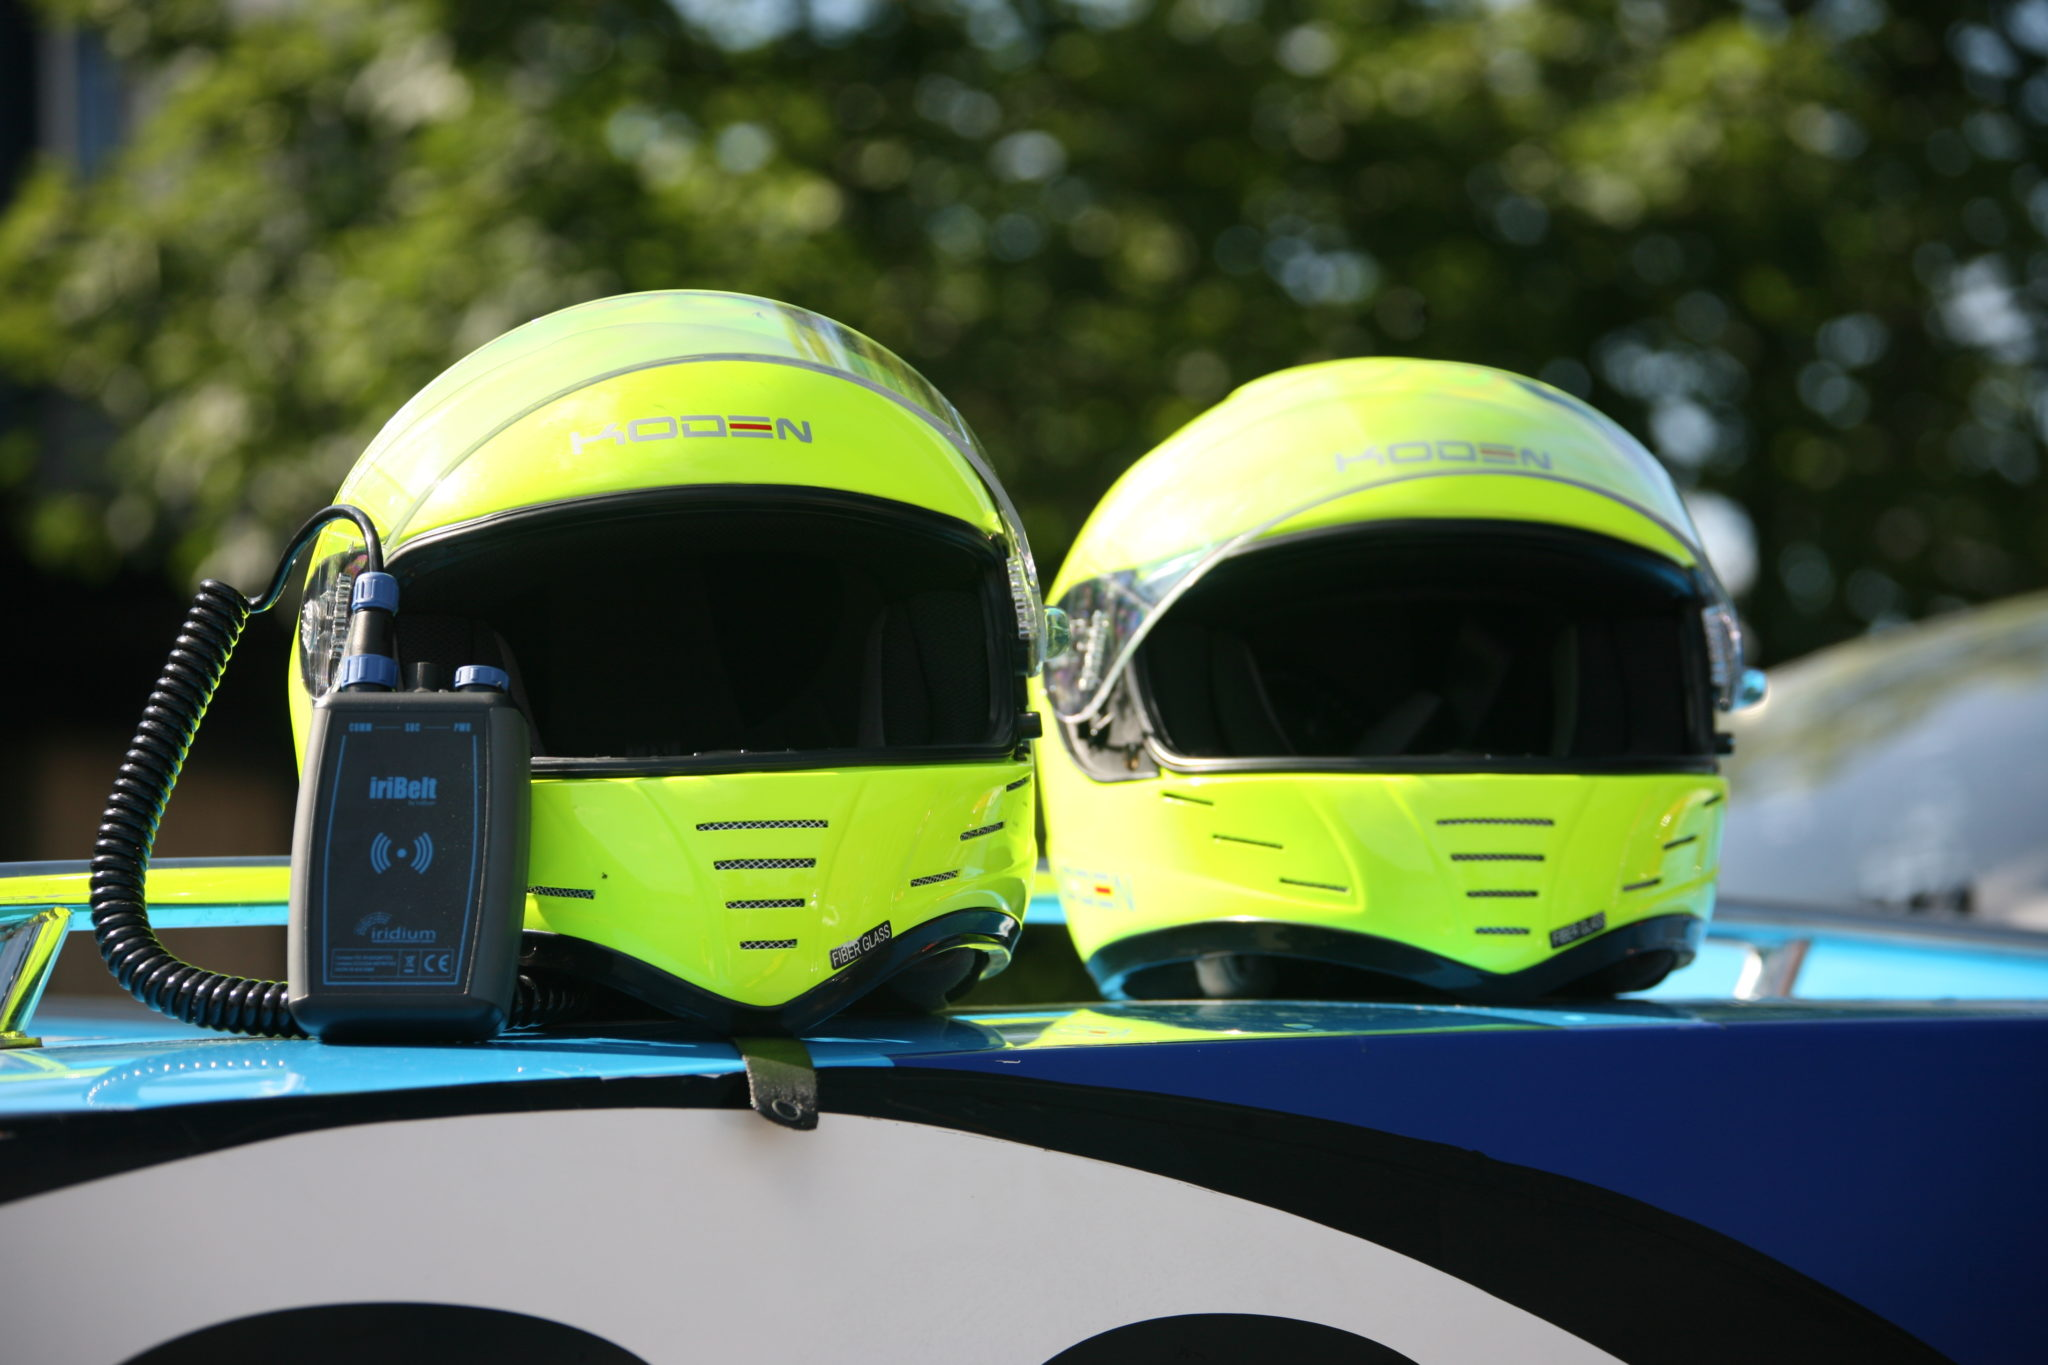 Helmet attachments